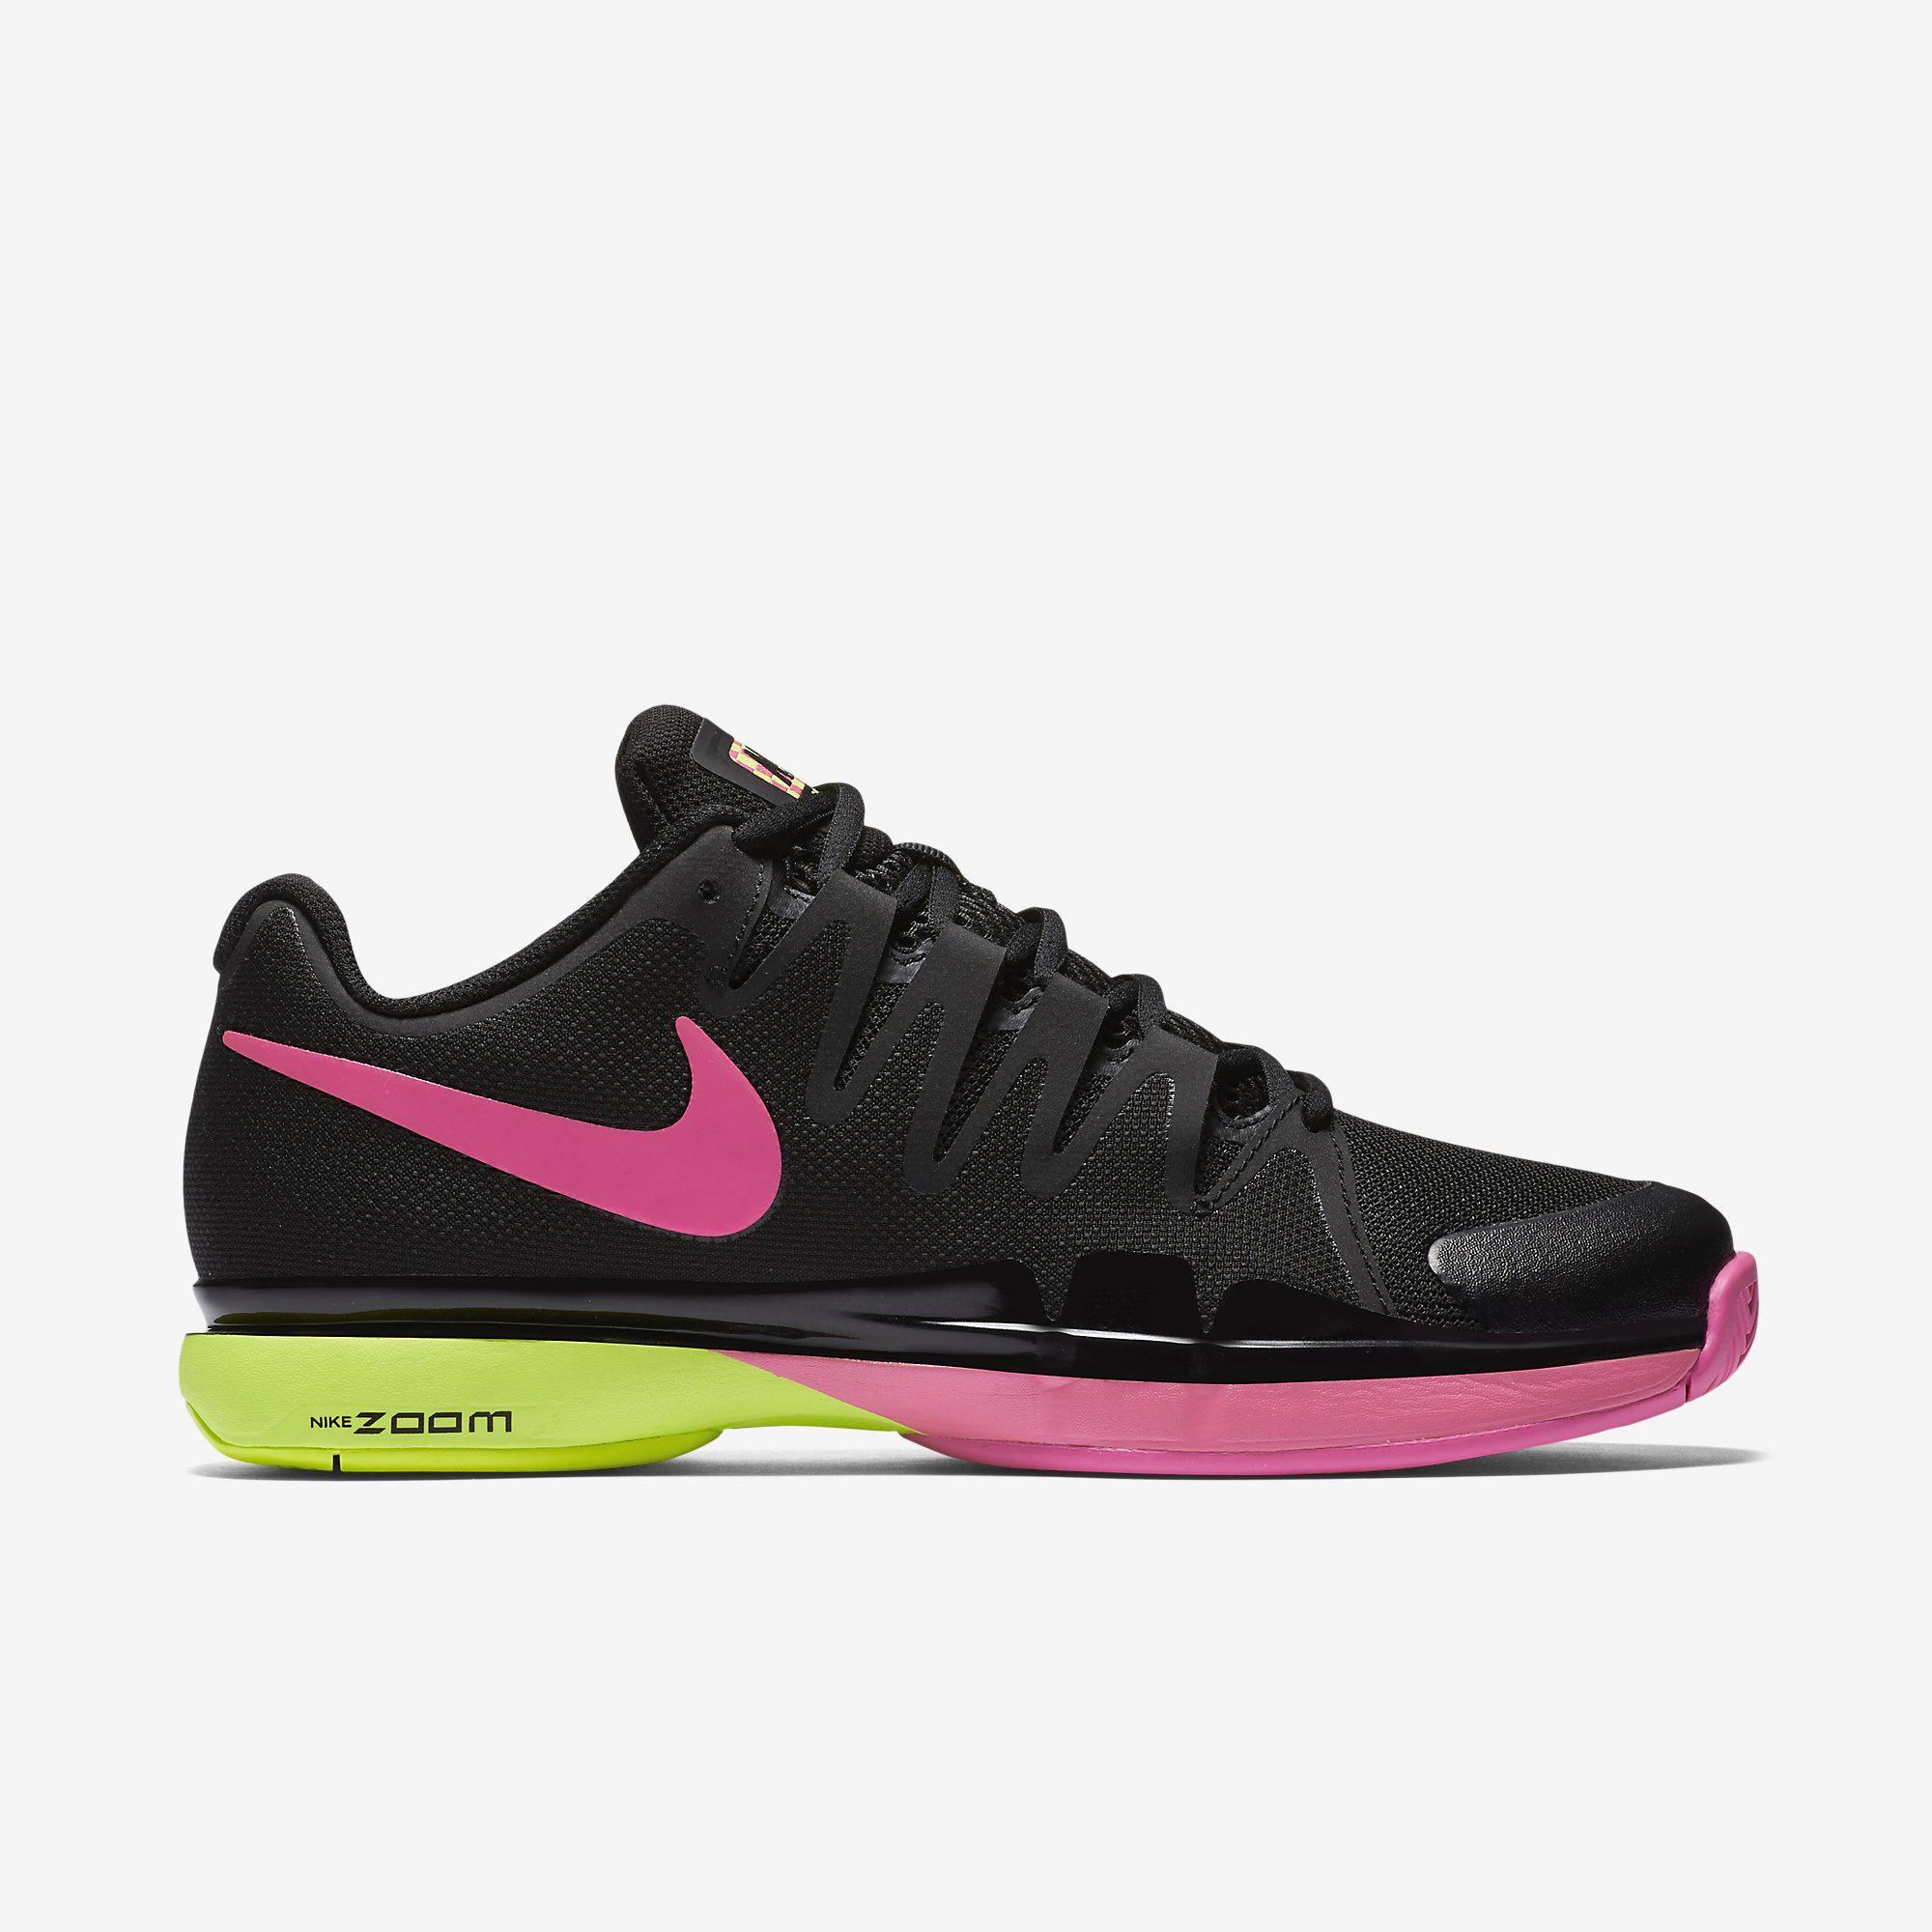 nike womens zoom vapor 9 5 tennis shoes  volt  pink